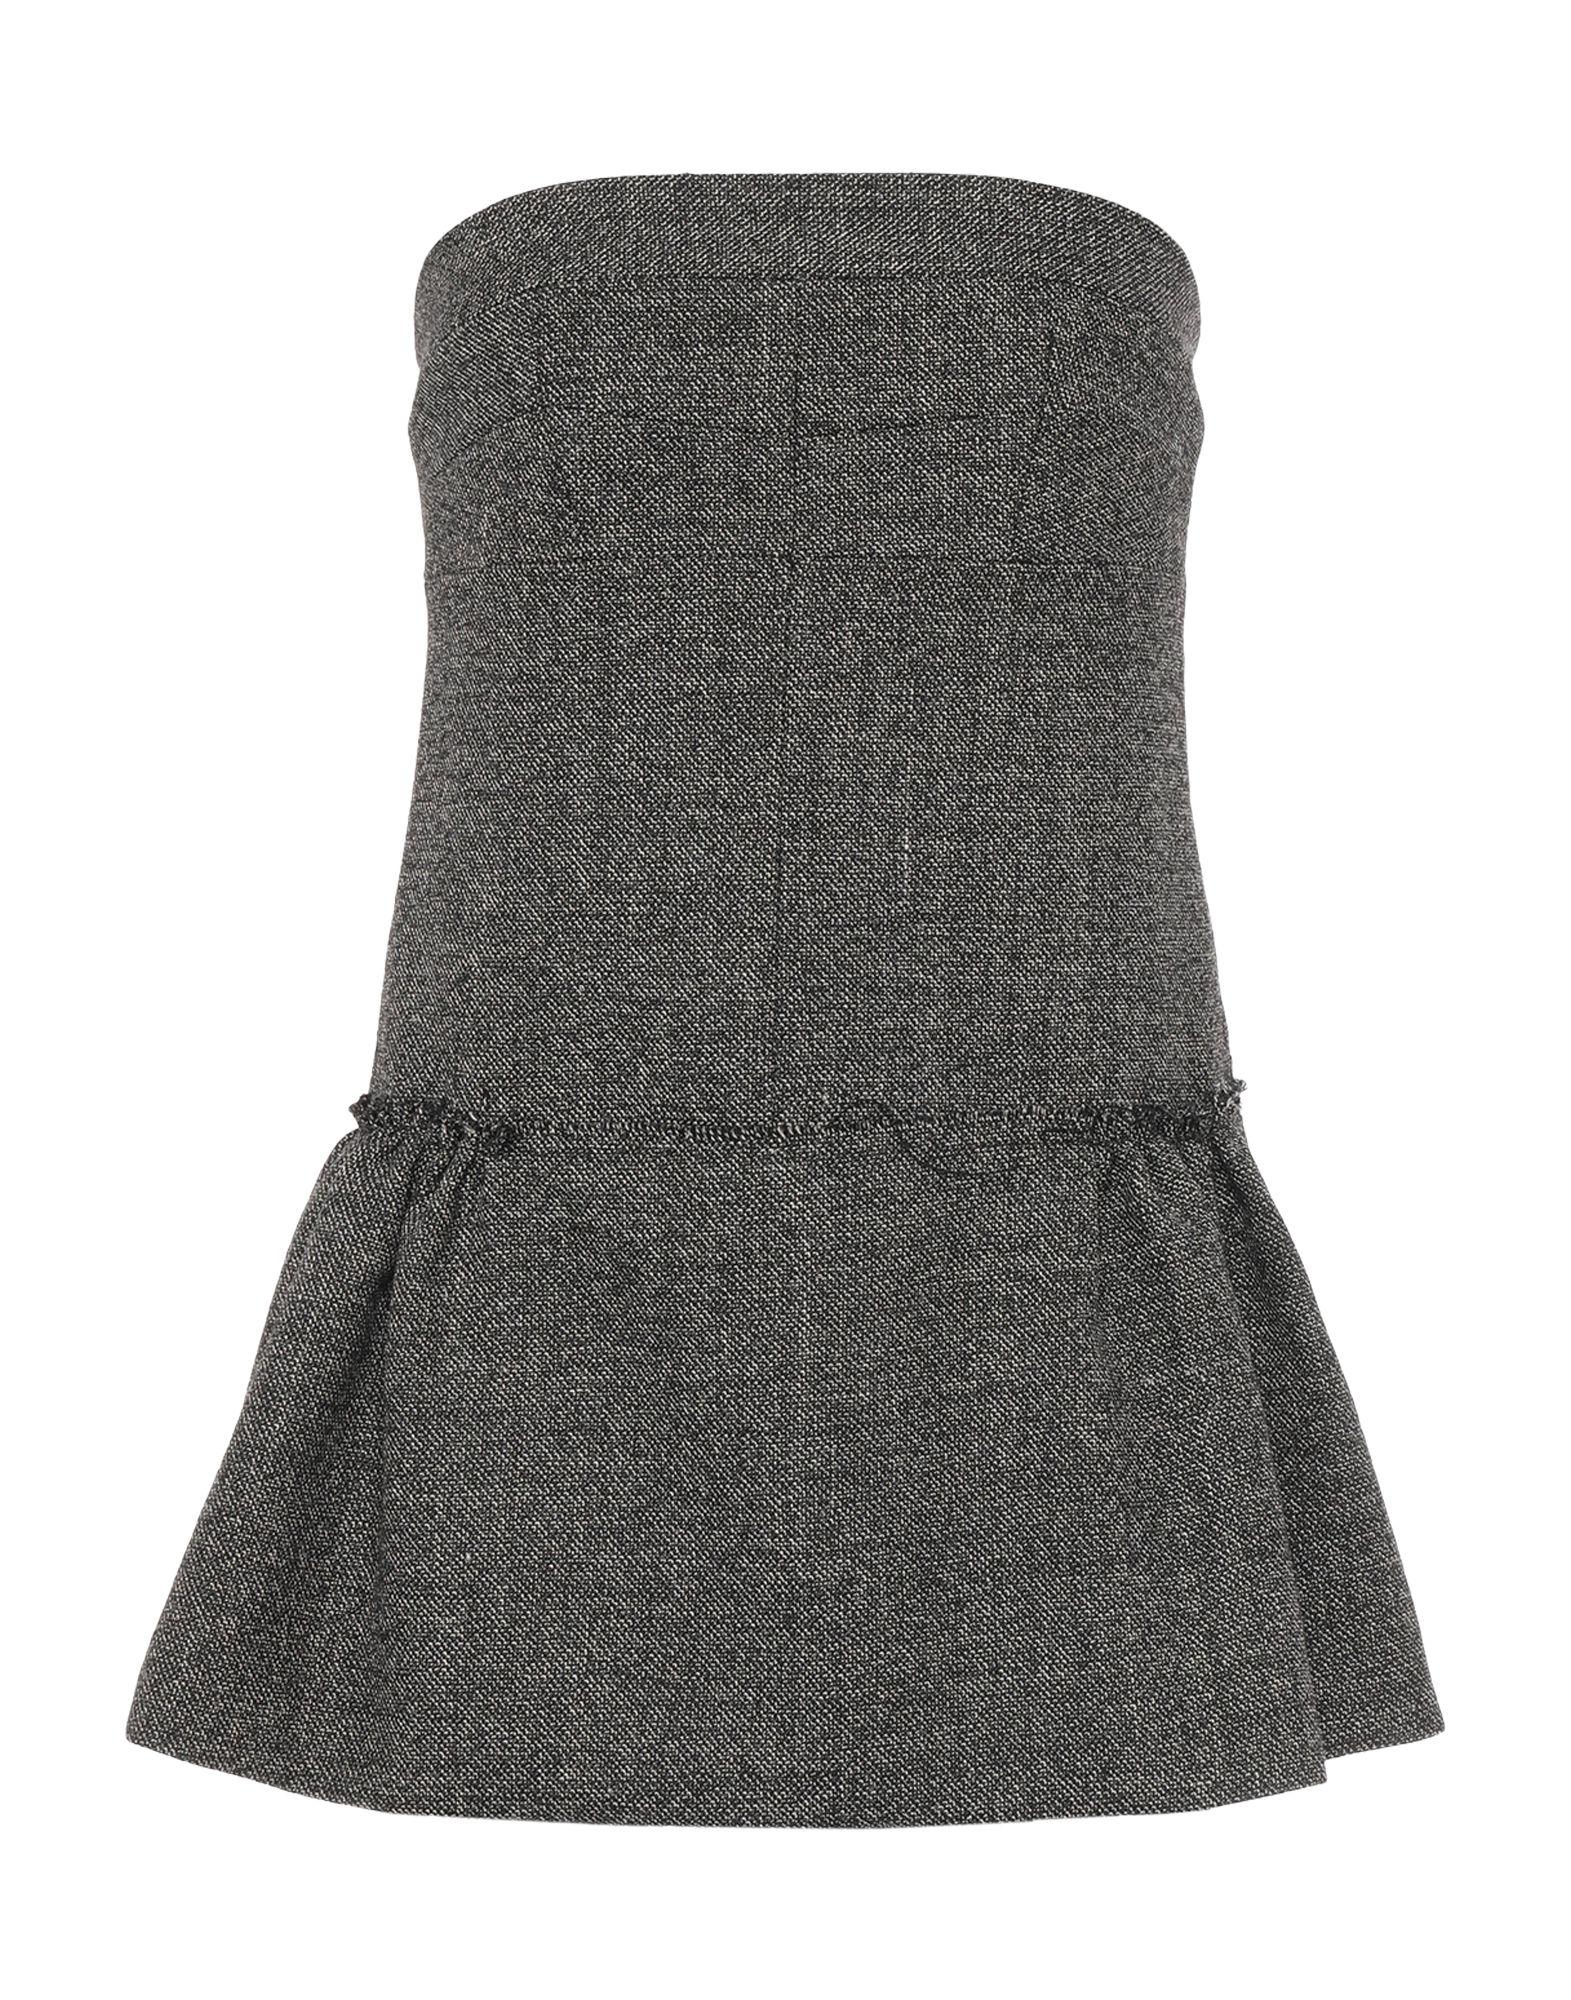 MARNI Tube tops. flannel, no appliqués, two-tone, deep neckline, sleeveless, rear closure, no pockets, zip, internal bra, large sized. 94% Virgin Wool, 6% Polyamide